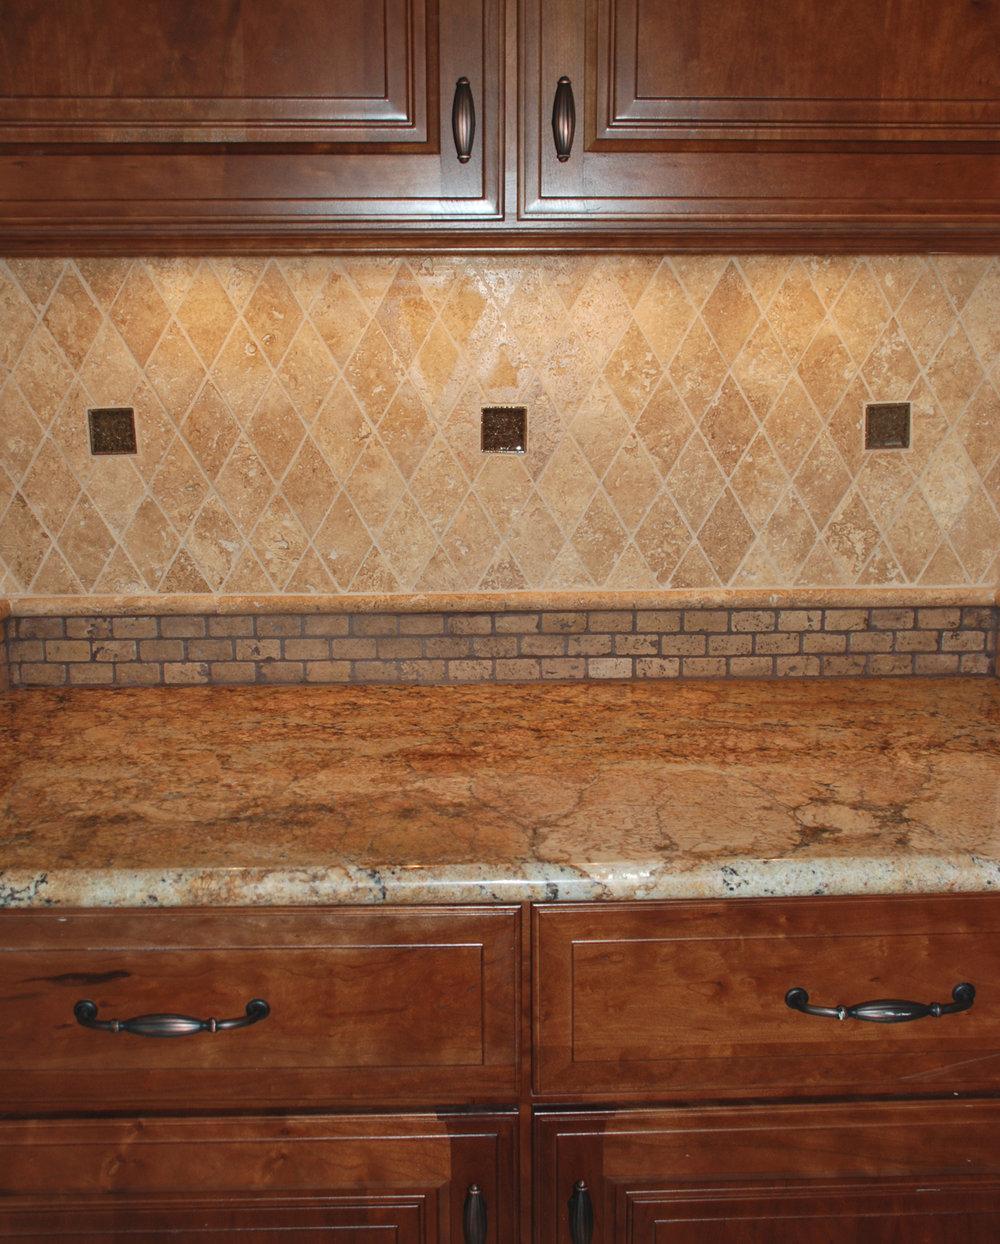 Kitchen tile studio tile stone tumbled travertine backsplash tileg dailygadgetfo Choice Image